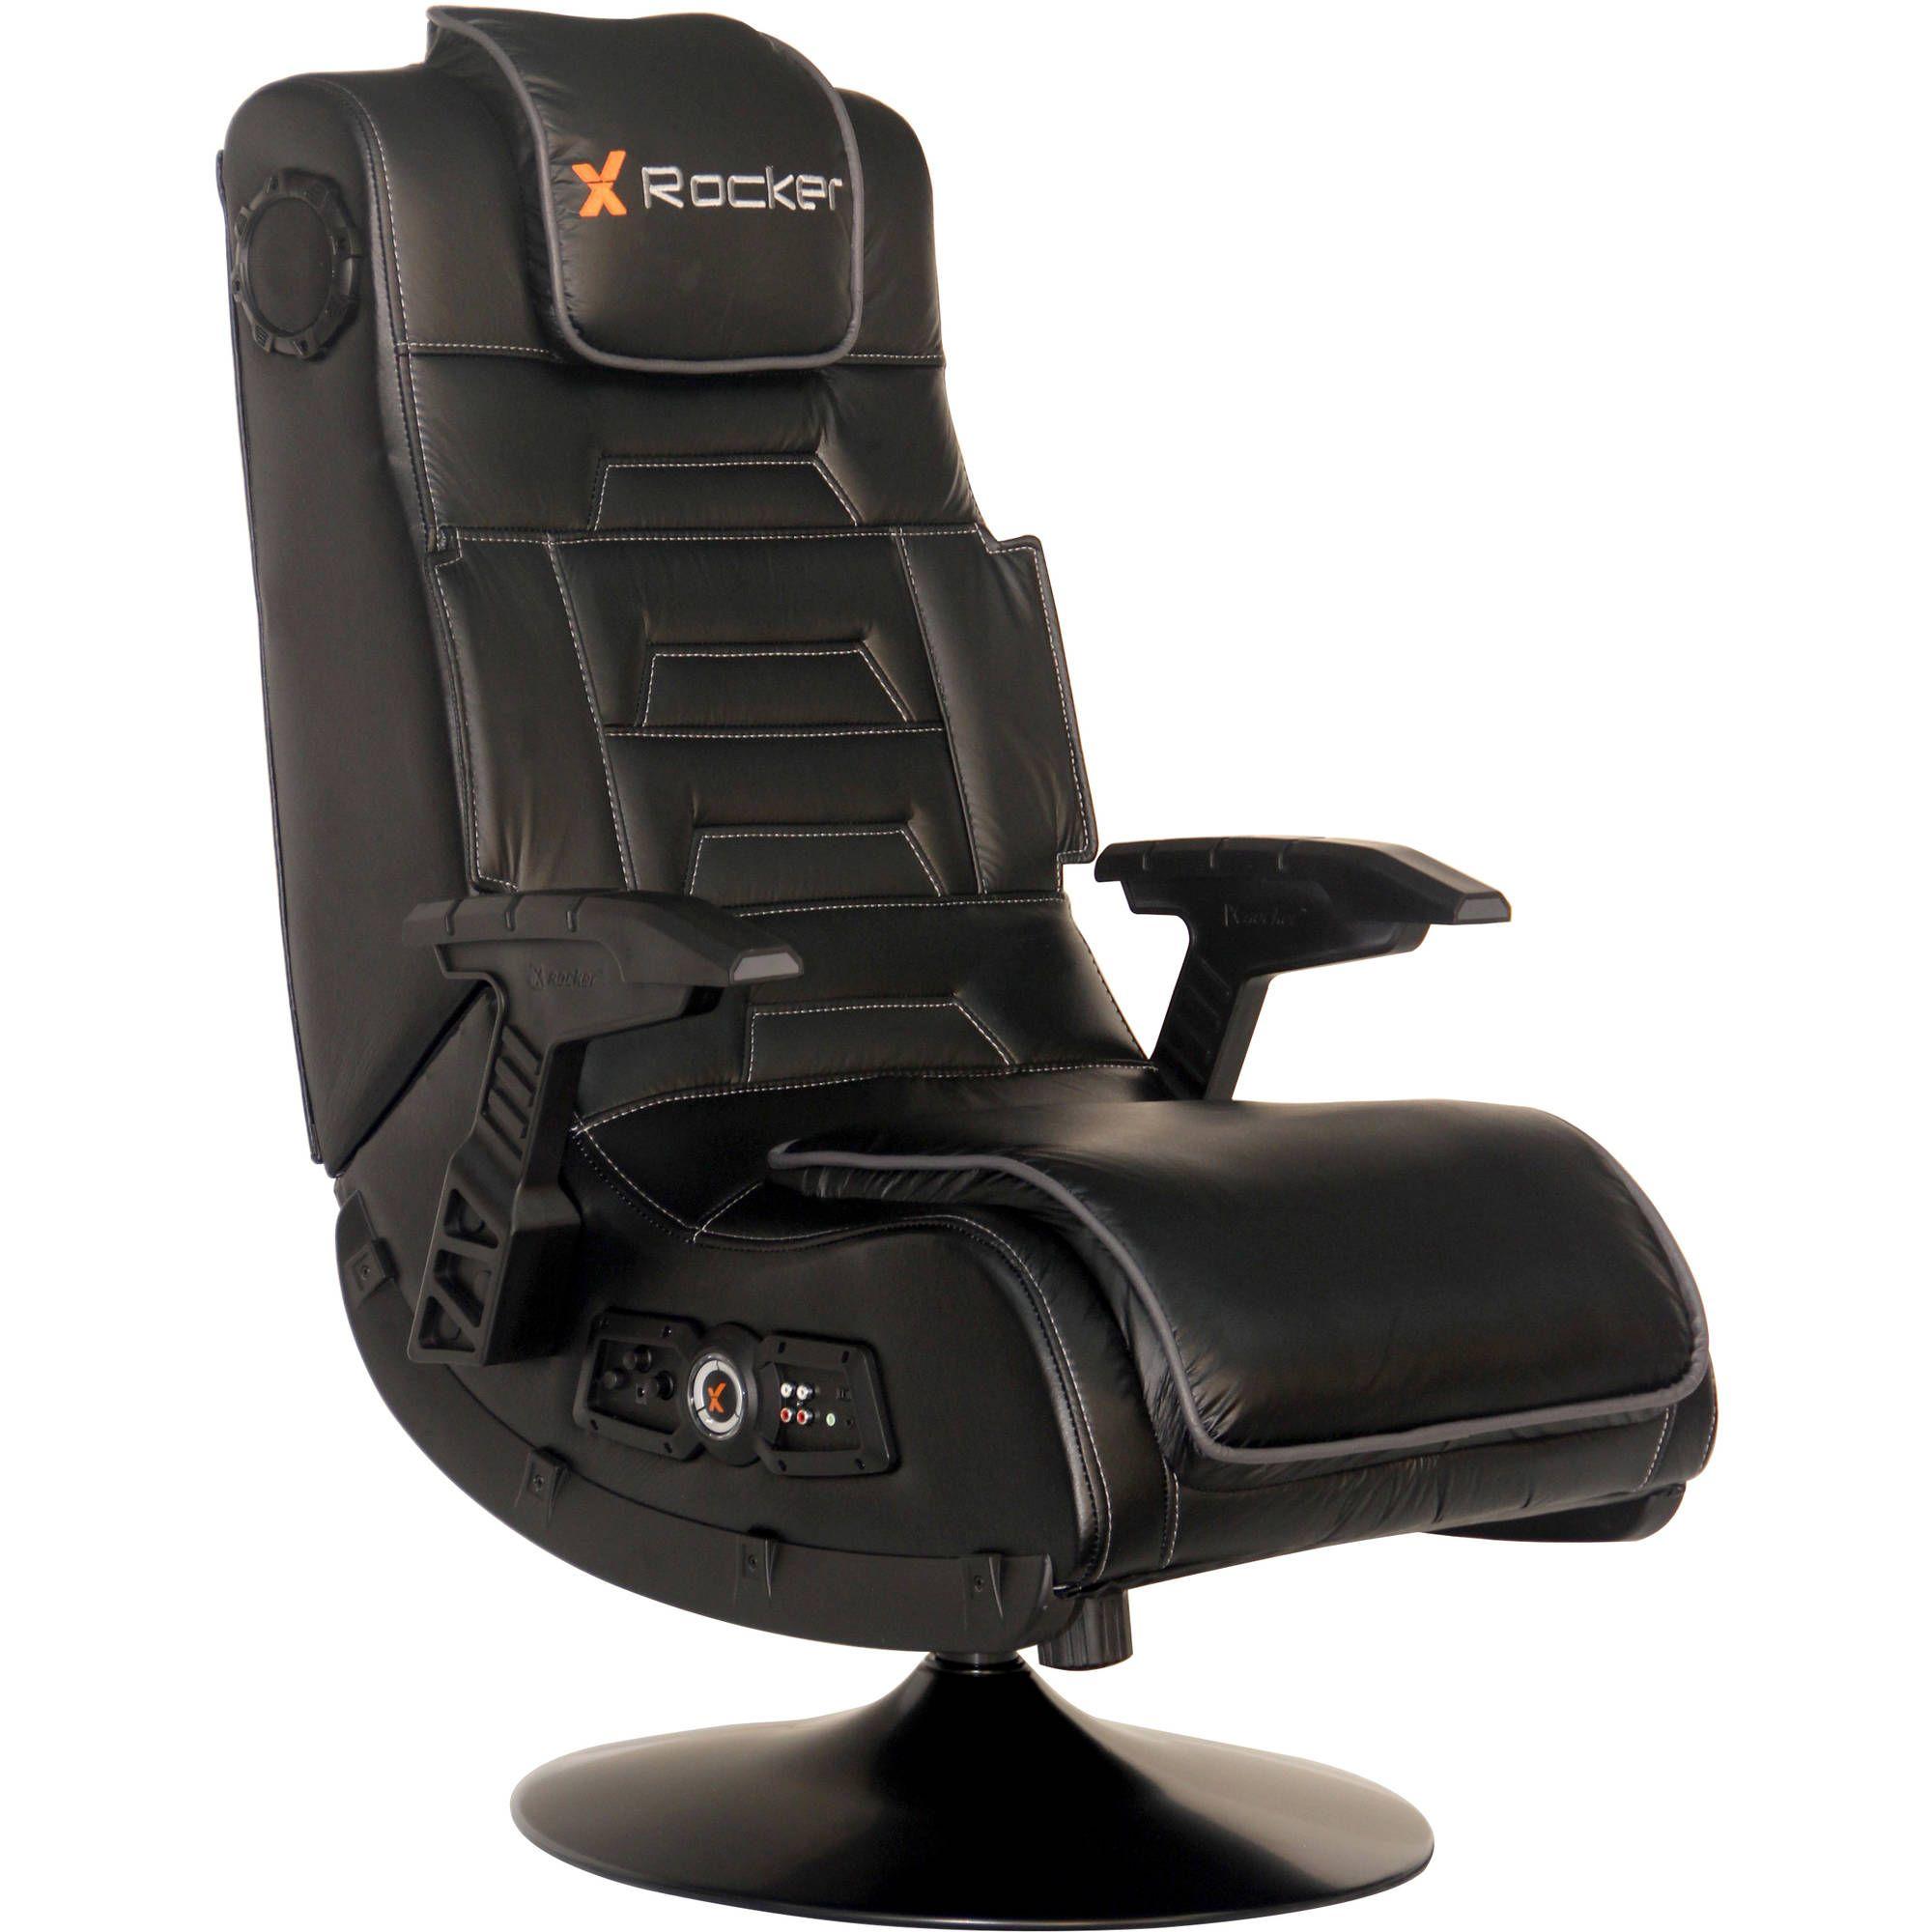 X Rocker Pro Series Pedestal Wireless Gaming Chair Black 51396